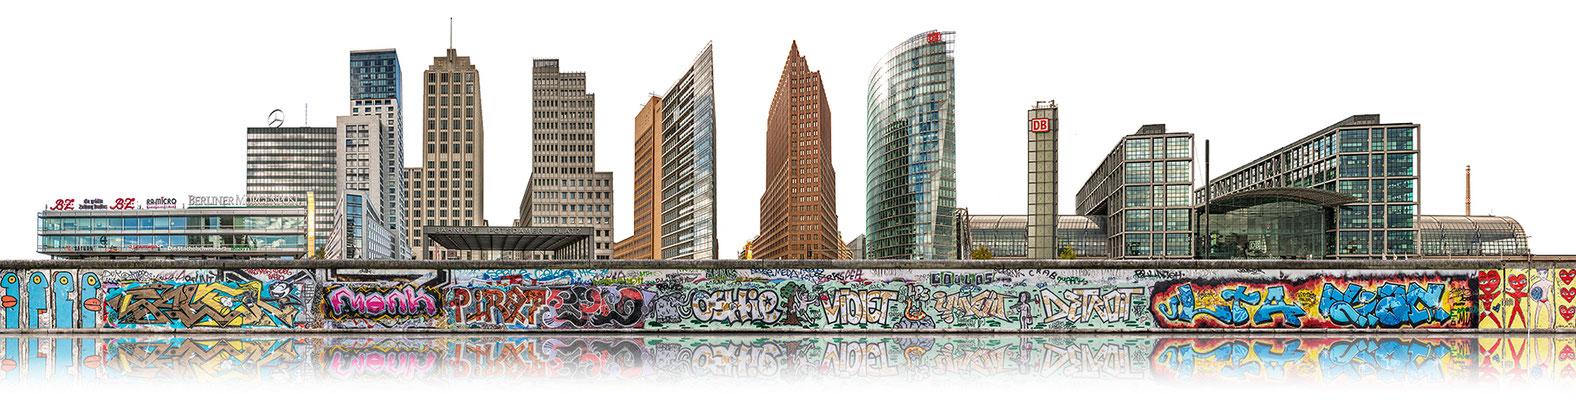 Berliner Mauer 2c